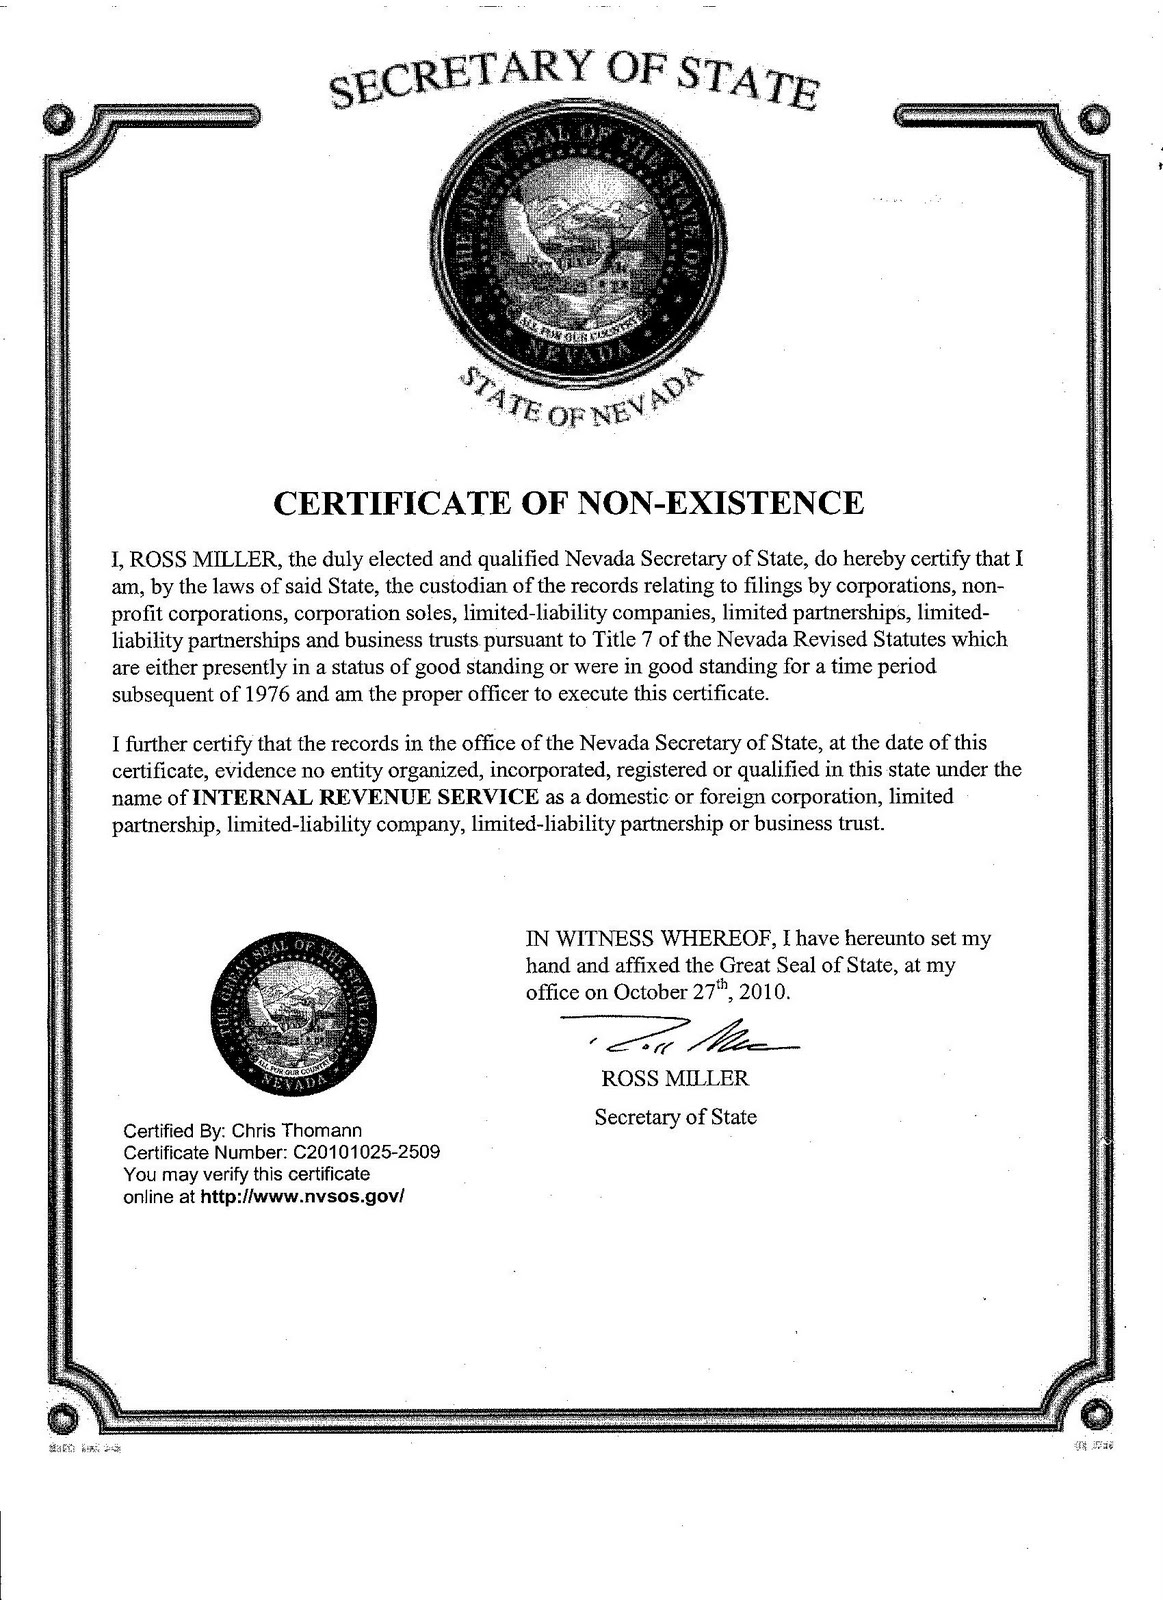 http://2.bp.blogspot.com/_6TJ6rrH6WzU/TMxfZCLvajI/AAAAAAAAACc/IW-HVHiSh94/s1600/IRS+SOS-Certificate+of+Non-Existence-779921.jpg